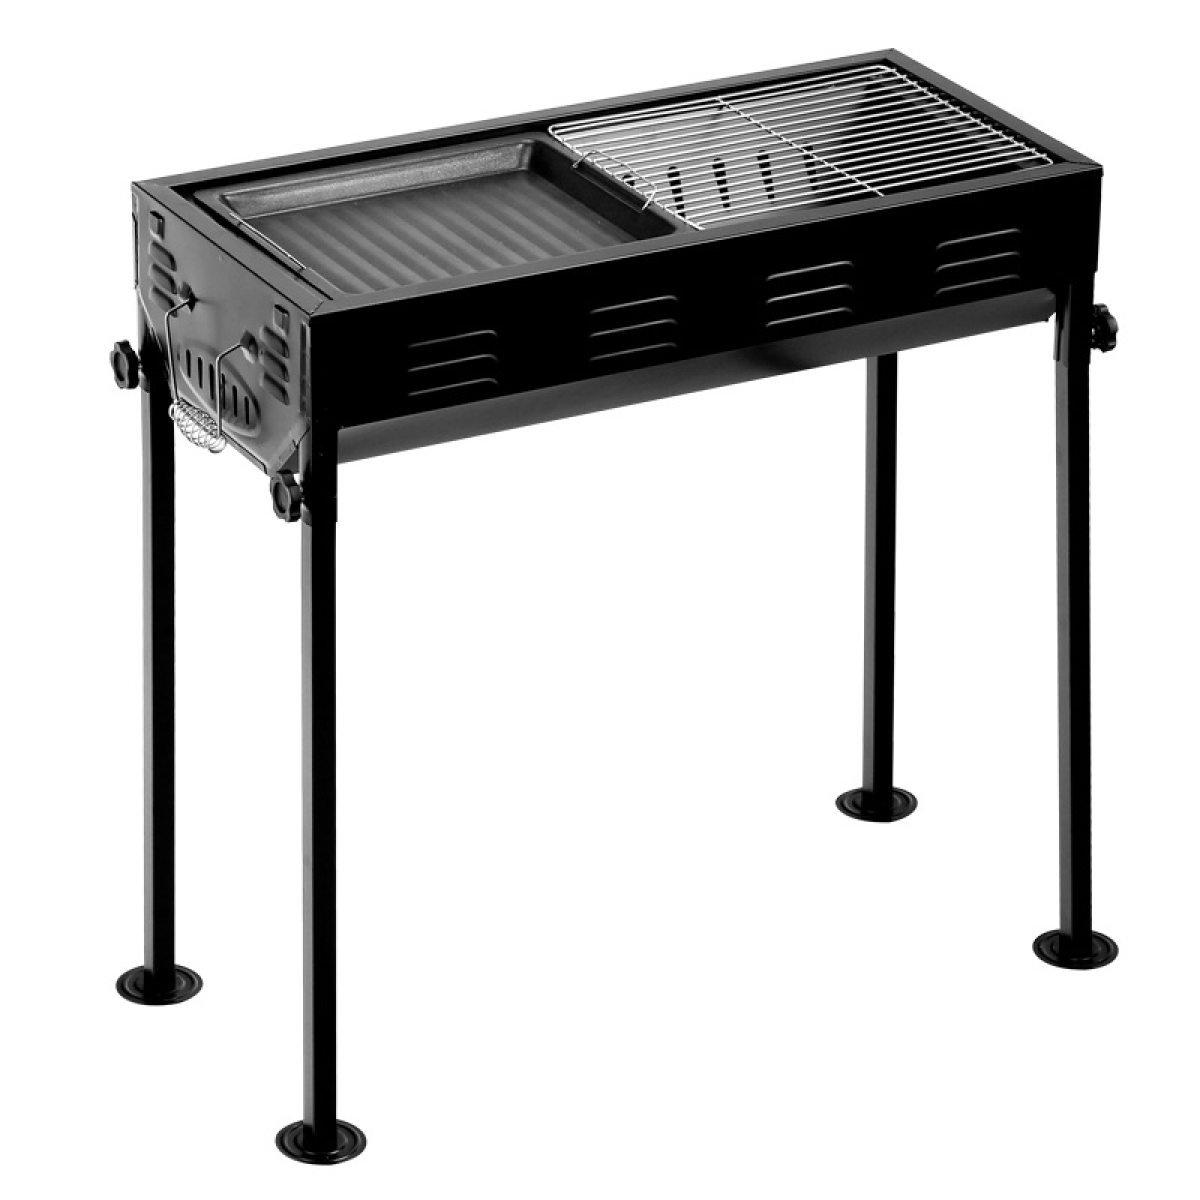 Outdoor Grill Falten Barbecue